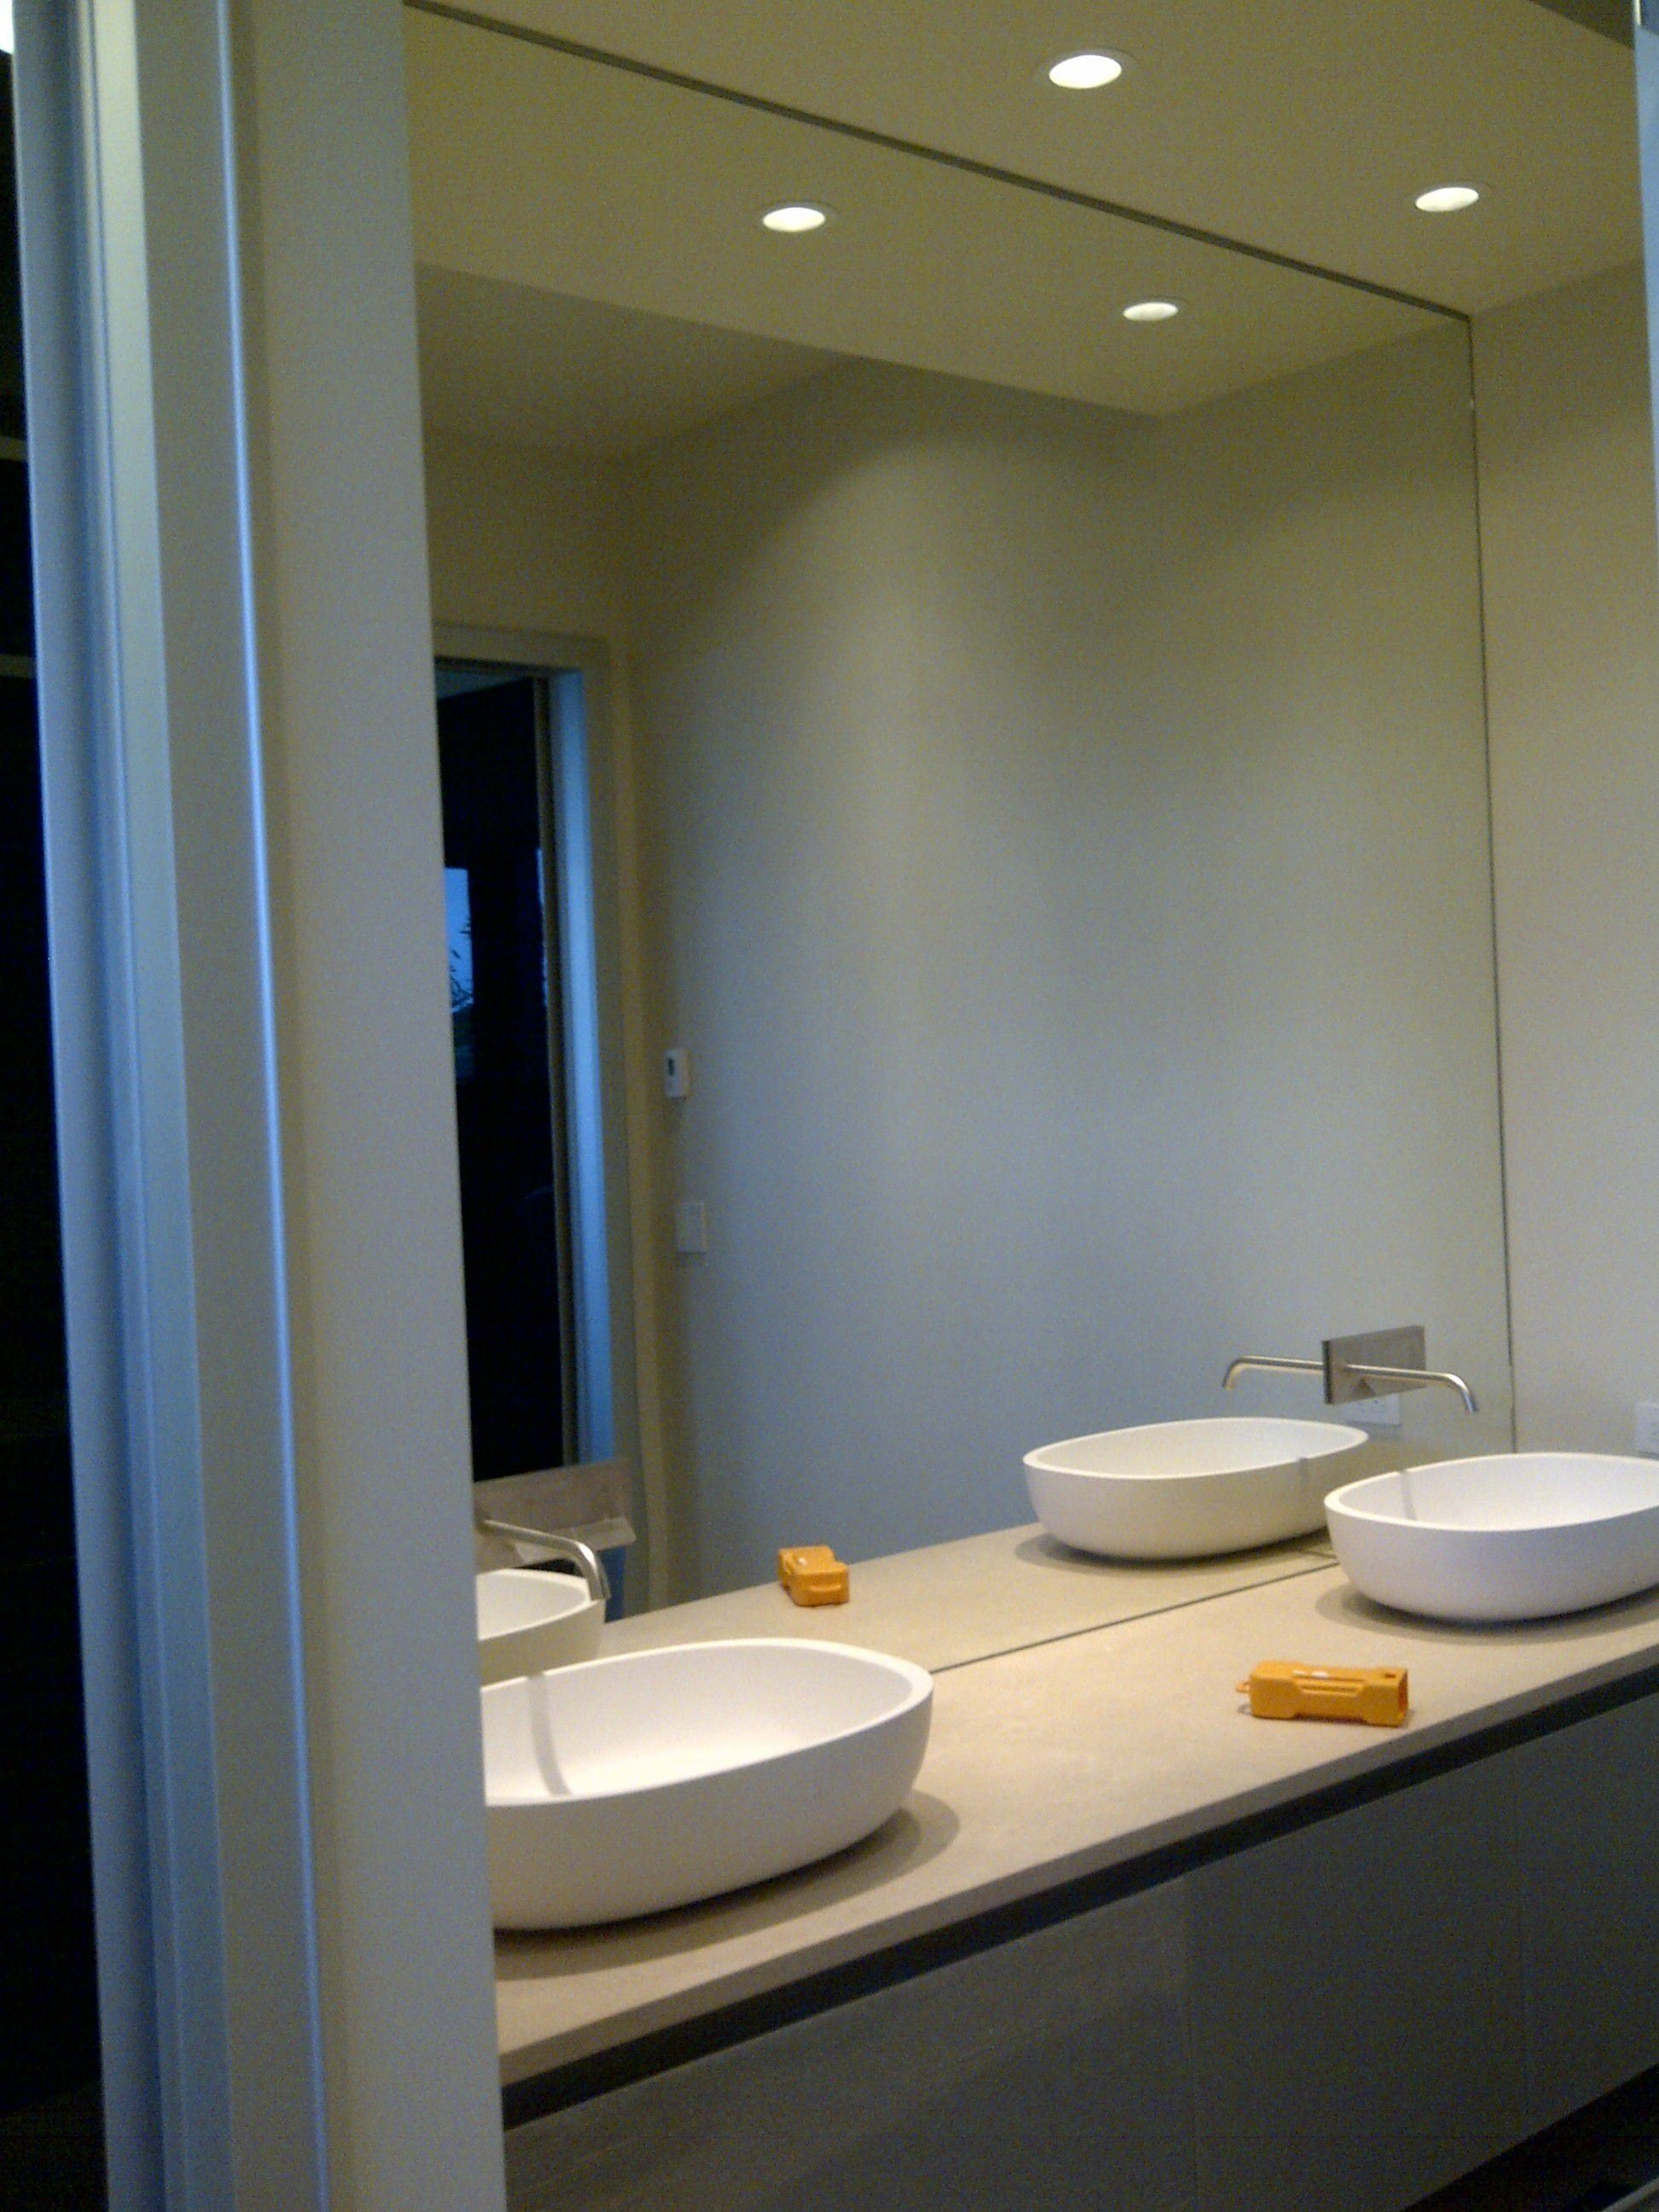 Wall Mirror Ideas Bathroom Mirror Wall Bathroom Small Bathroom Mirrors Mirror Wall Living Room